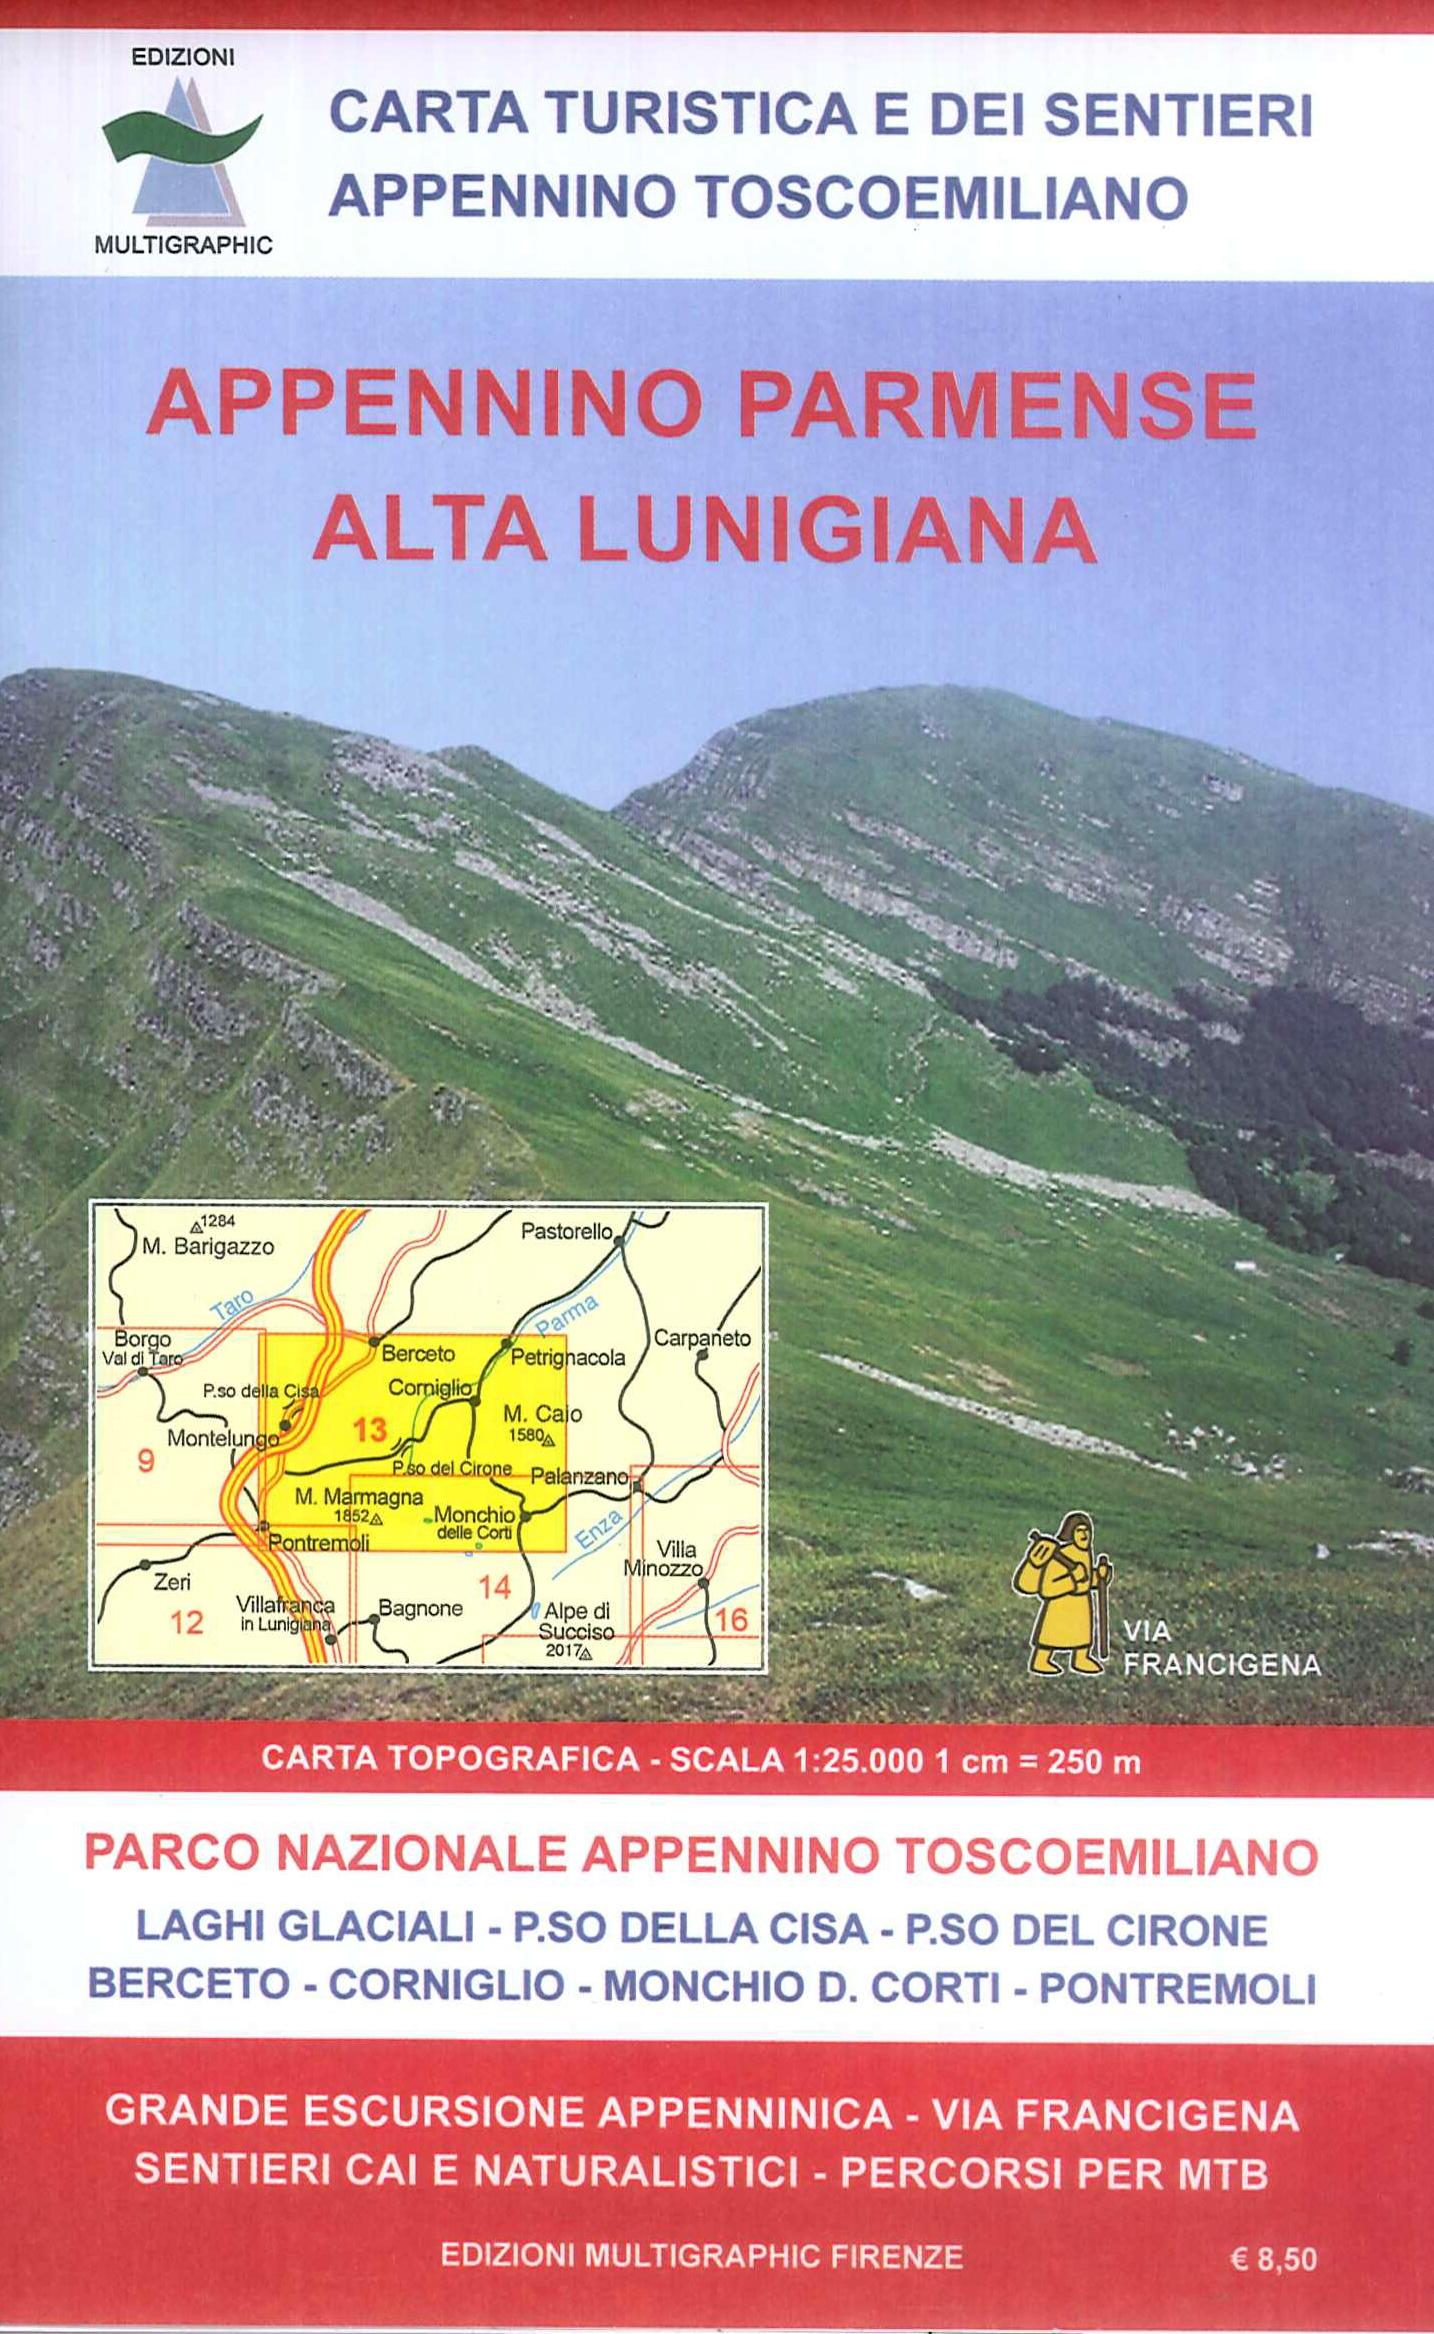 Appennino Parmense Alta Lunigiana. Carta dei Sentieri 1:25.000.